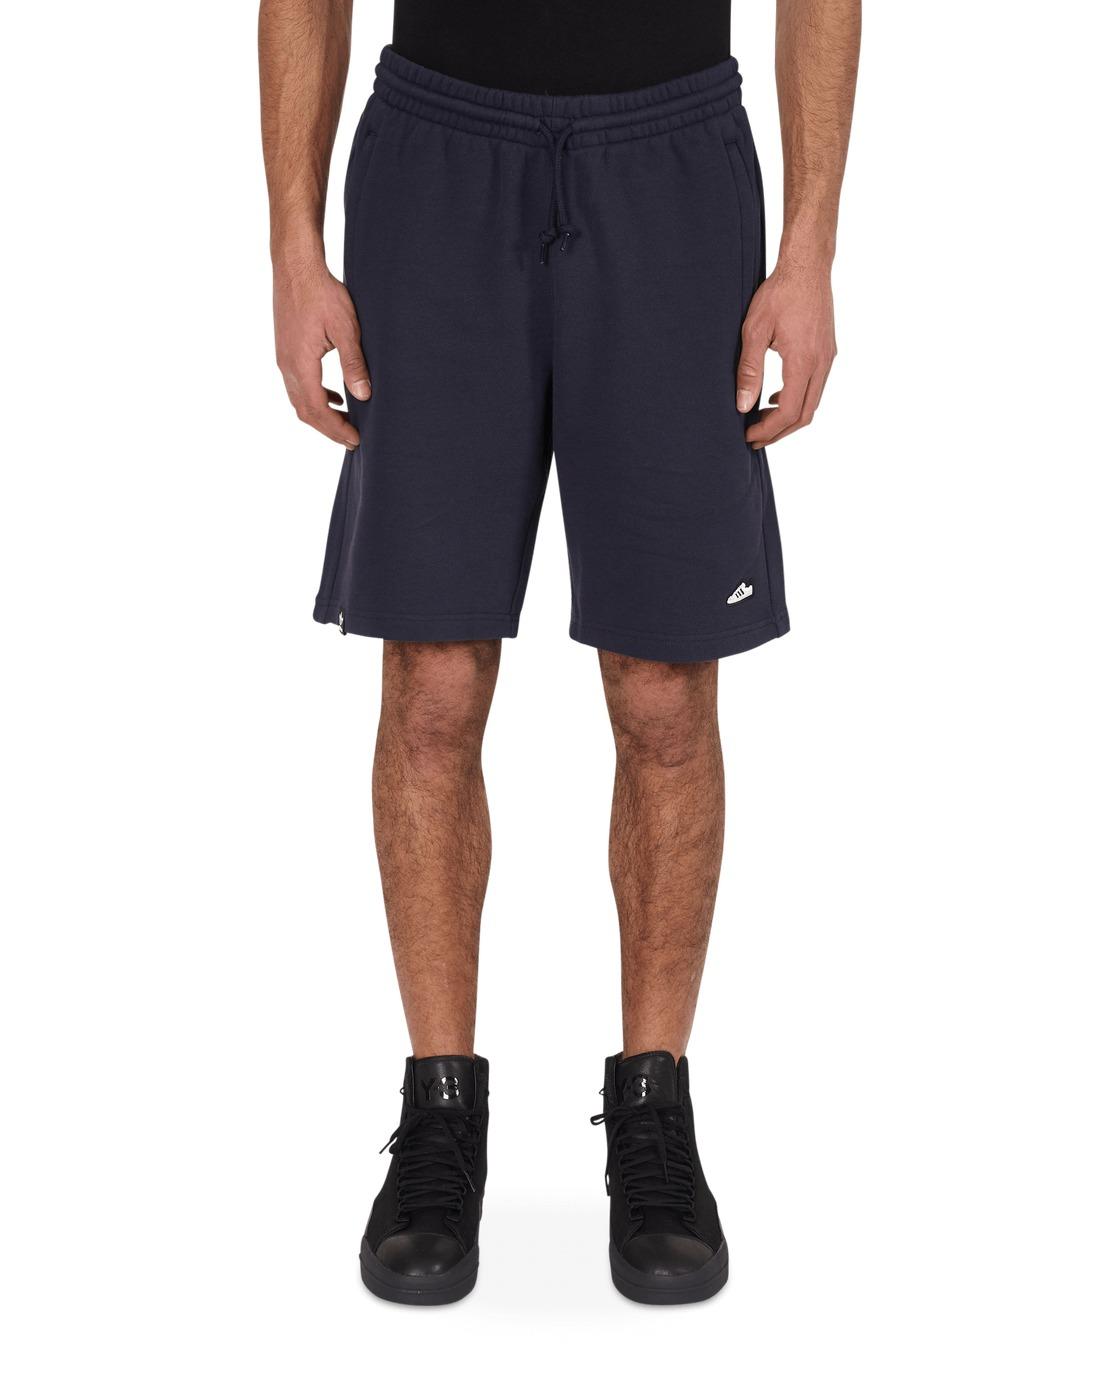 Adidas Originals Sst Emb Shorts Legend Ink